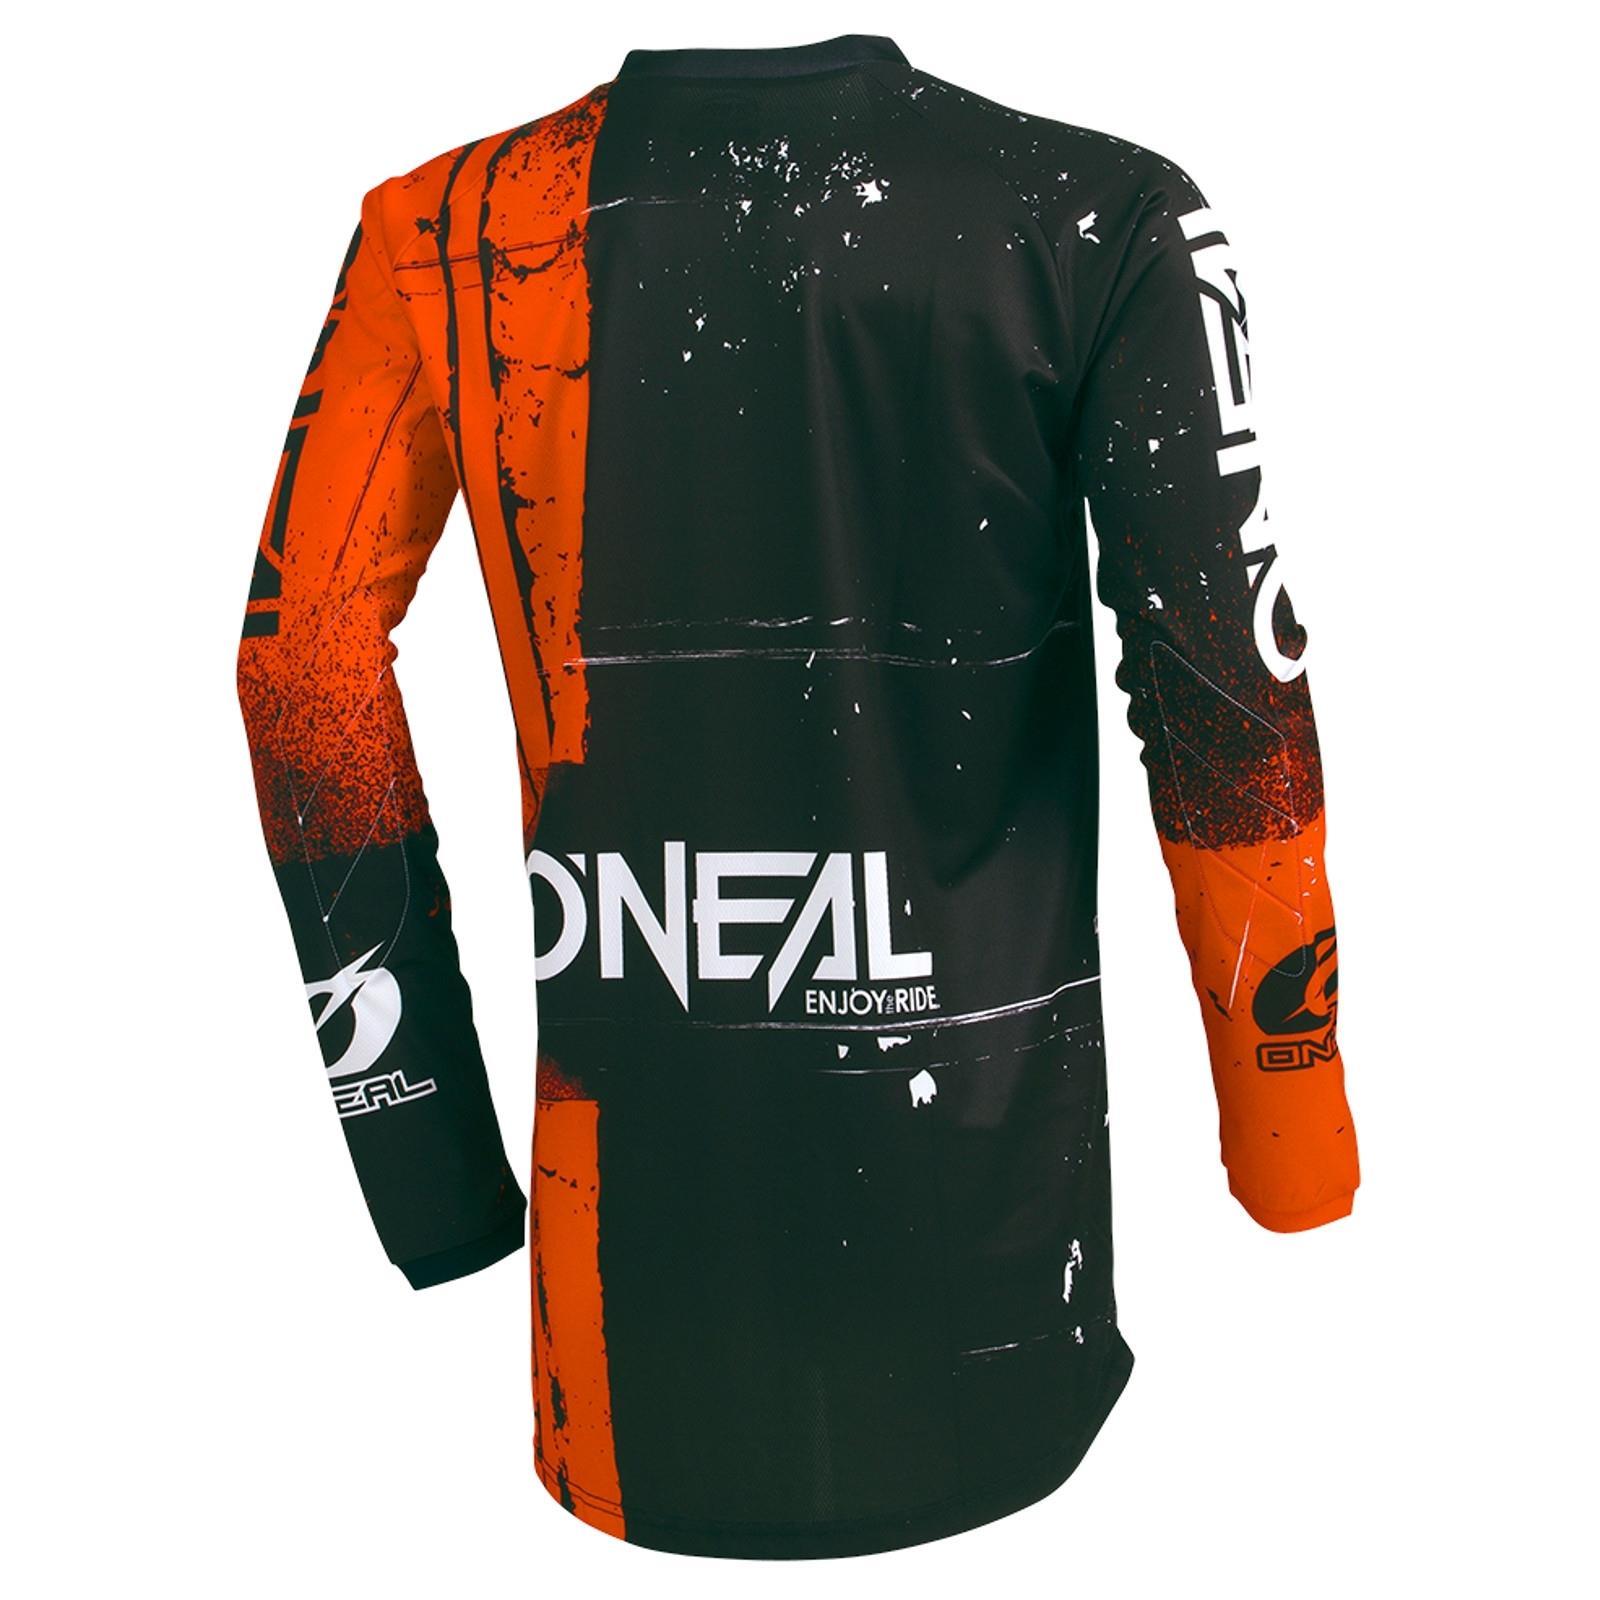 O-039-Neal-elemento-Mayhem-JERSEY-Racewear-Motocross-Maglia-MX-DH-FR-MTB-MOUNTAIN-BIKE miniatura 34